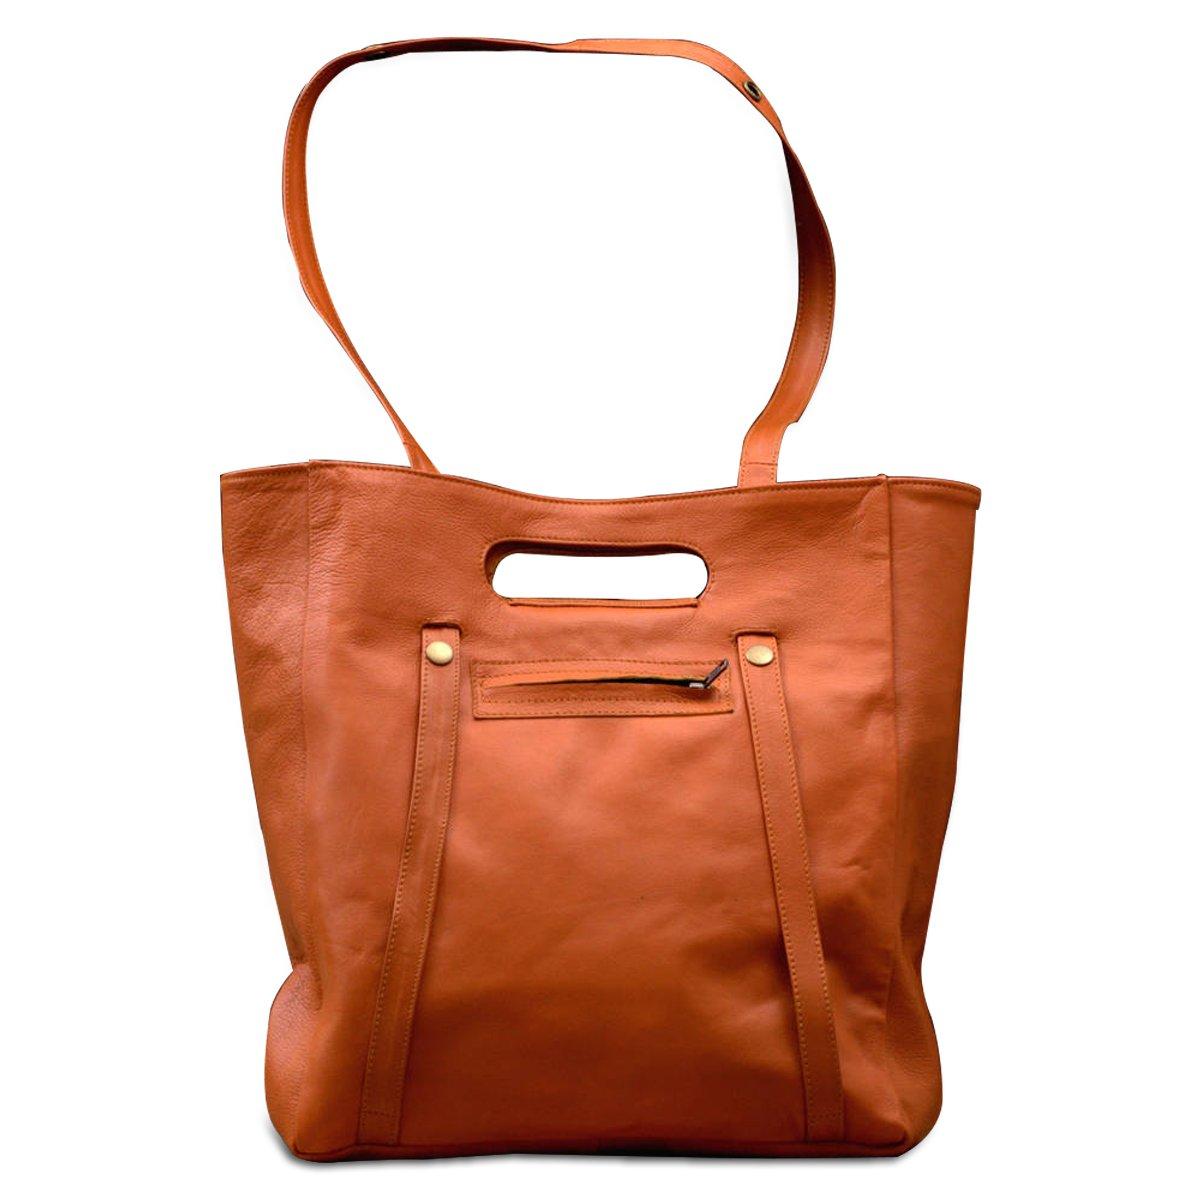 MONT5 Large Tan Leather Tote Handbag   Leather Purse   Ladies Shoulder Tote